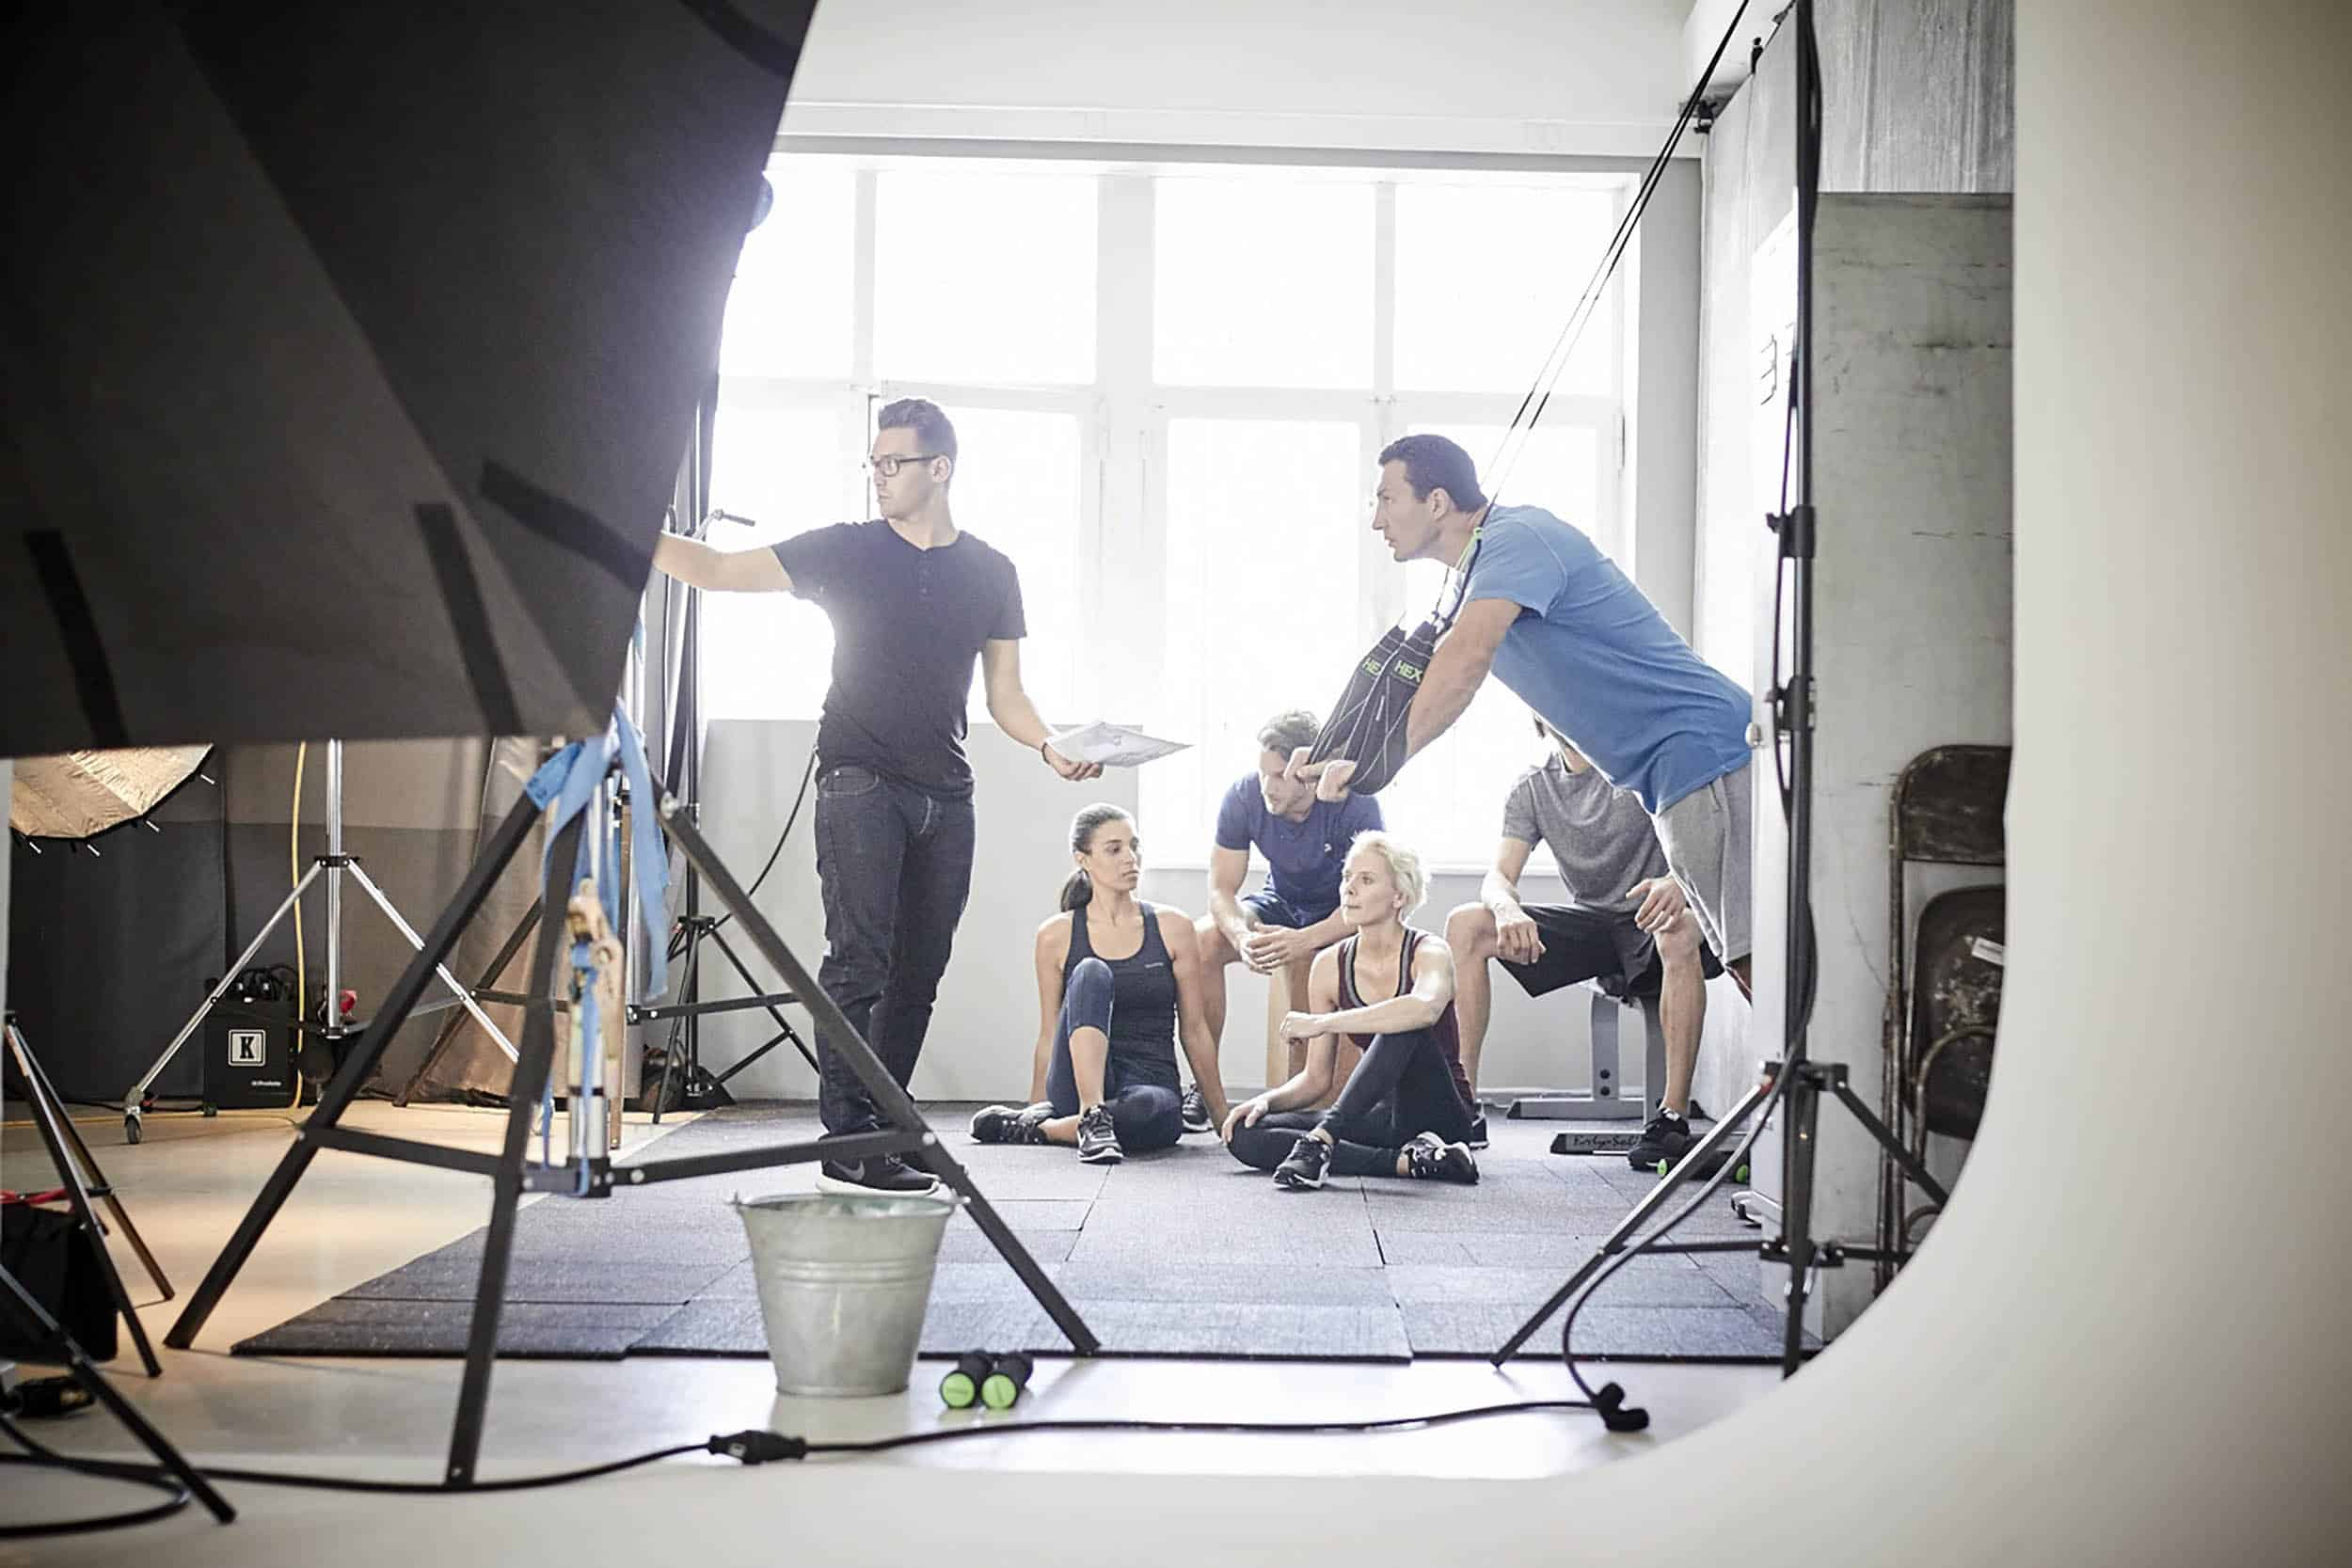 studio-ignatov-klitschko-warsteiner-imagekampagne-makingof-18